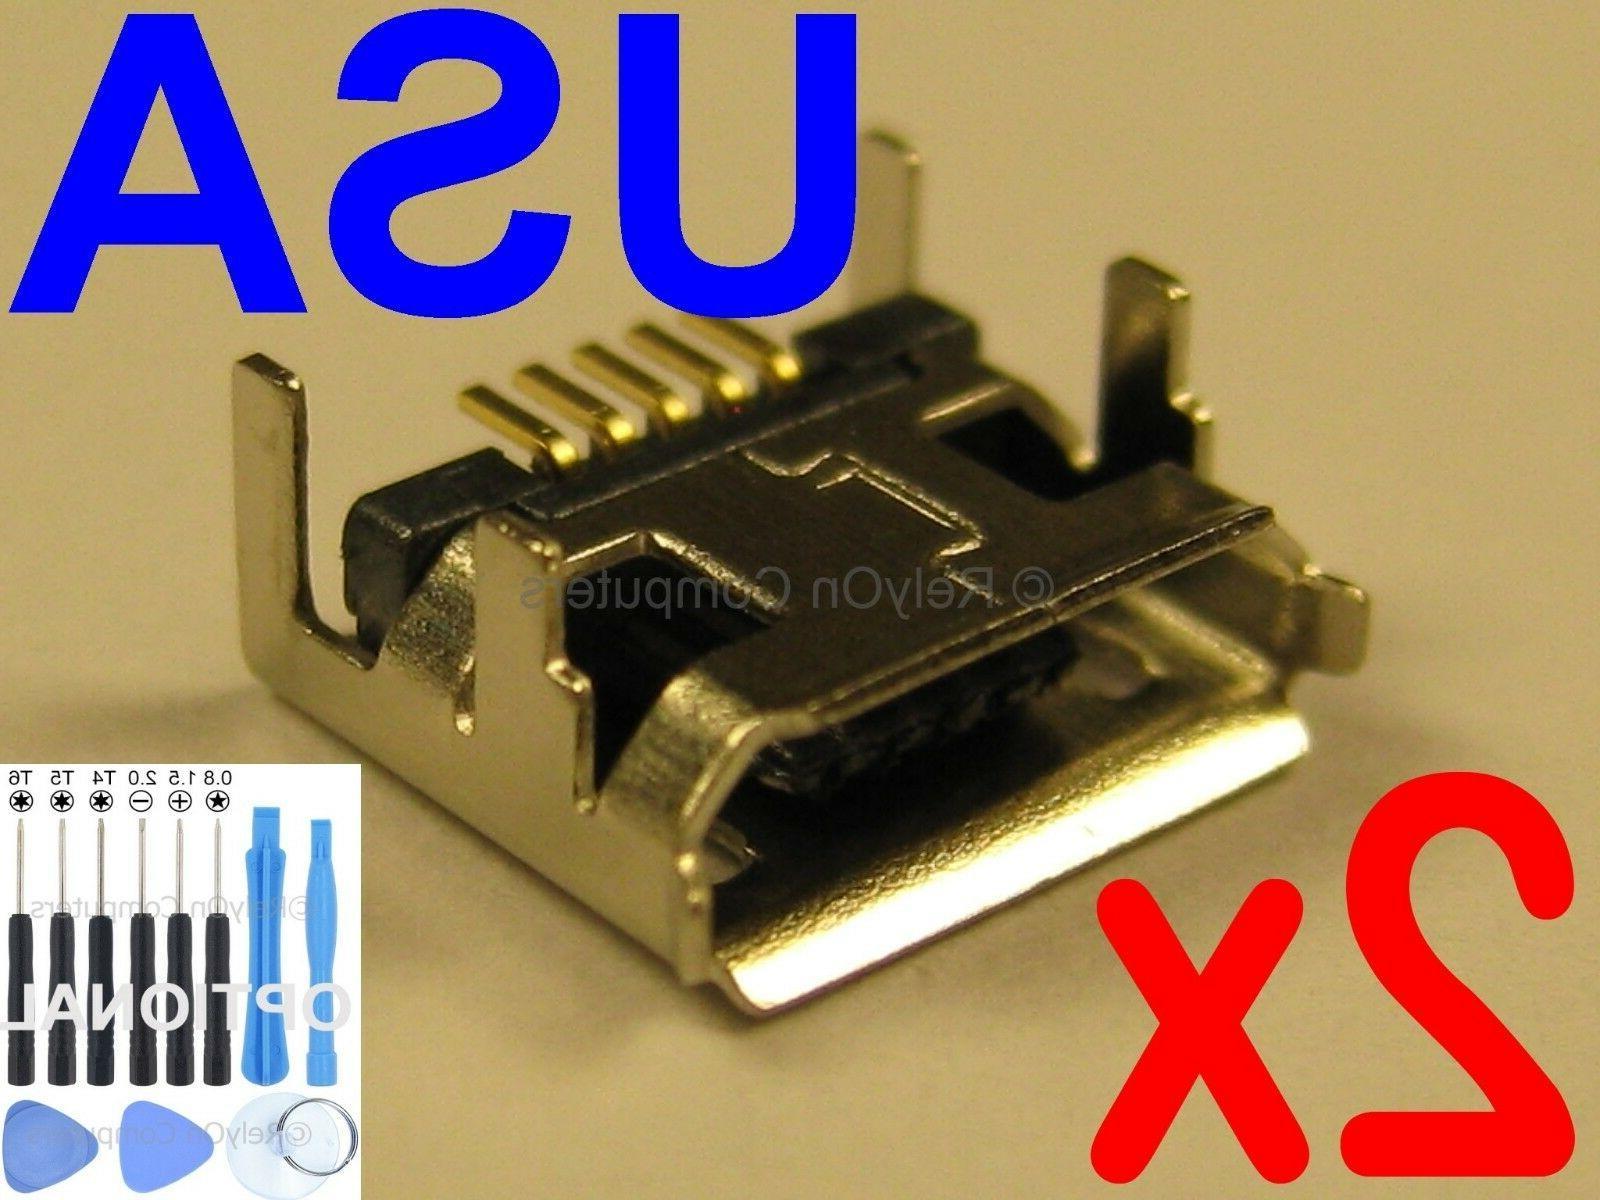 2x Lot of Micro USB Charging Port for JBL Flip 3 Bluetooth S